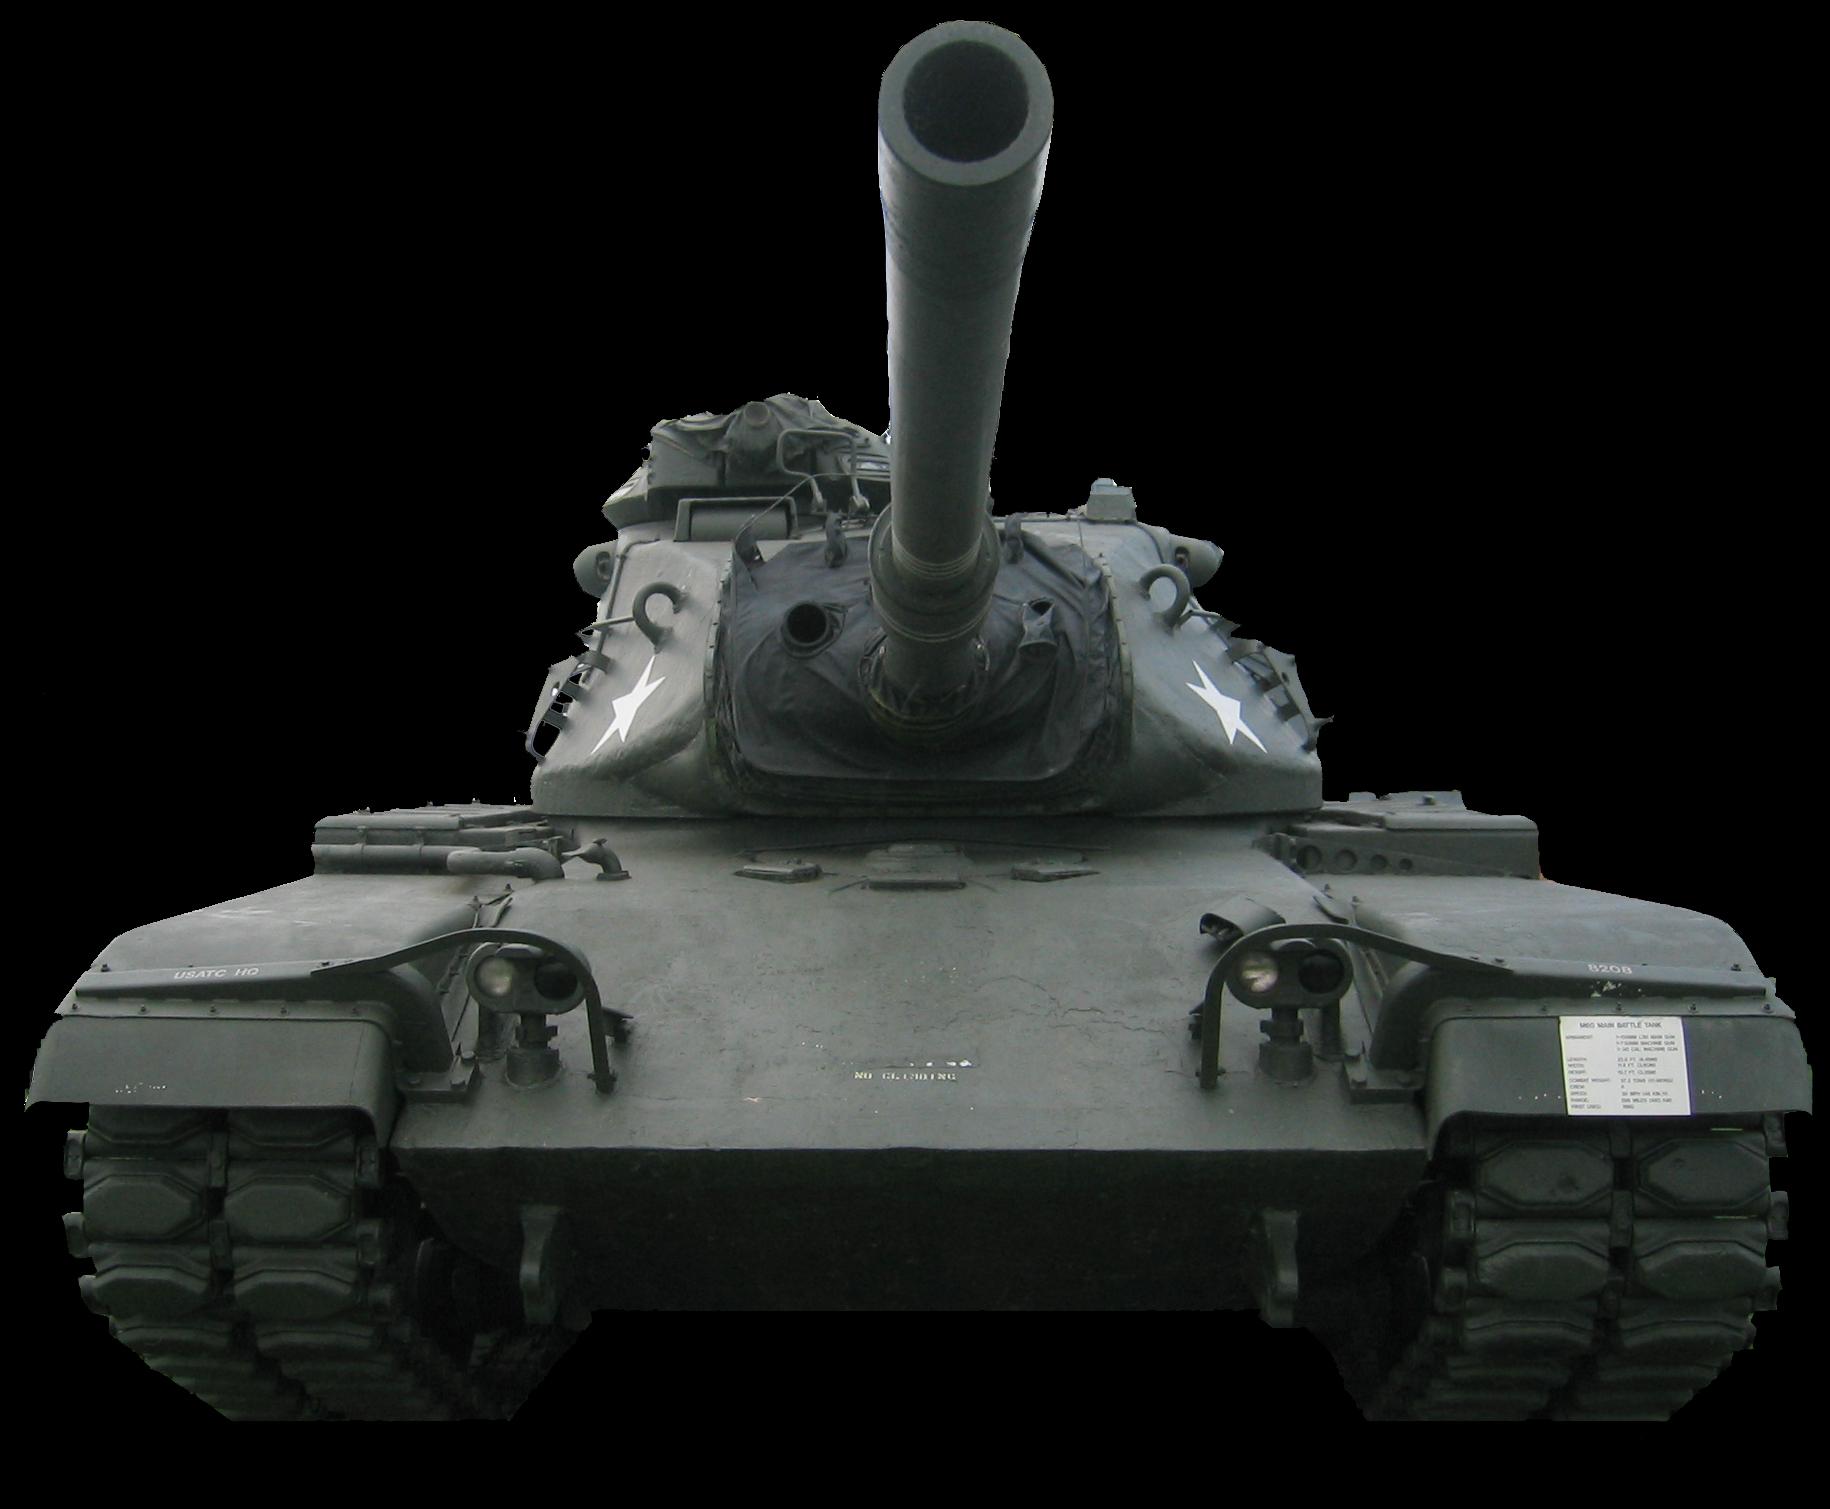 Tank on black